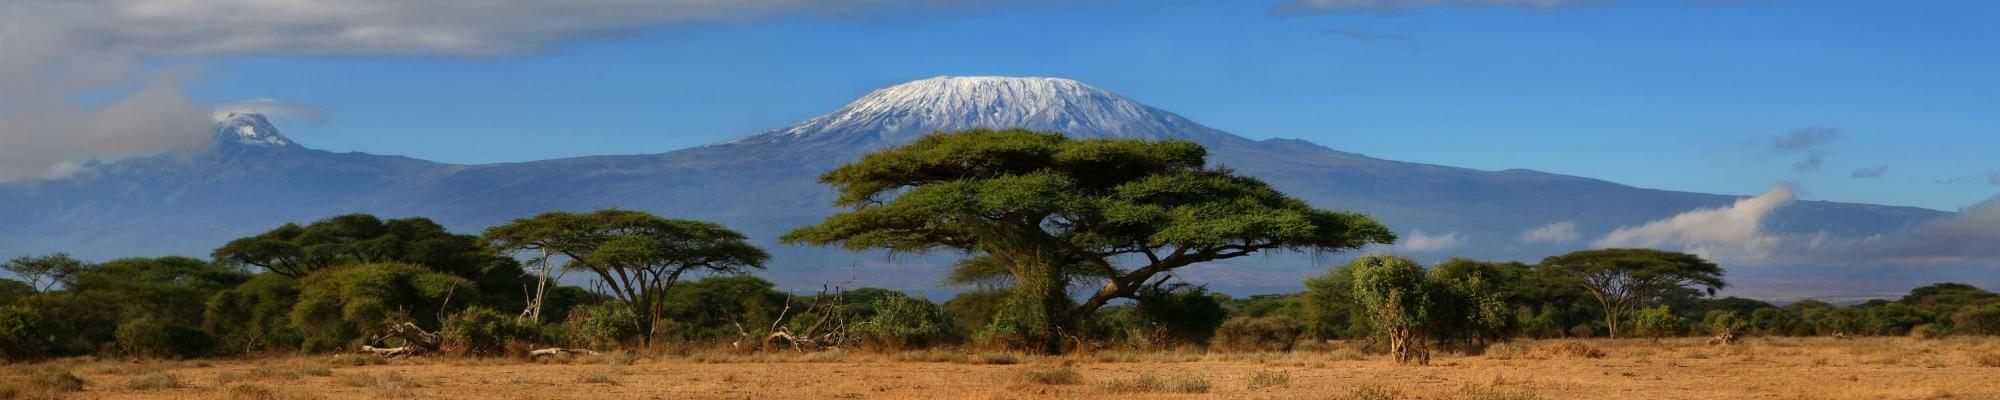 Le Kilimandjaro depuis Amboseli en safari au Kenya